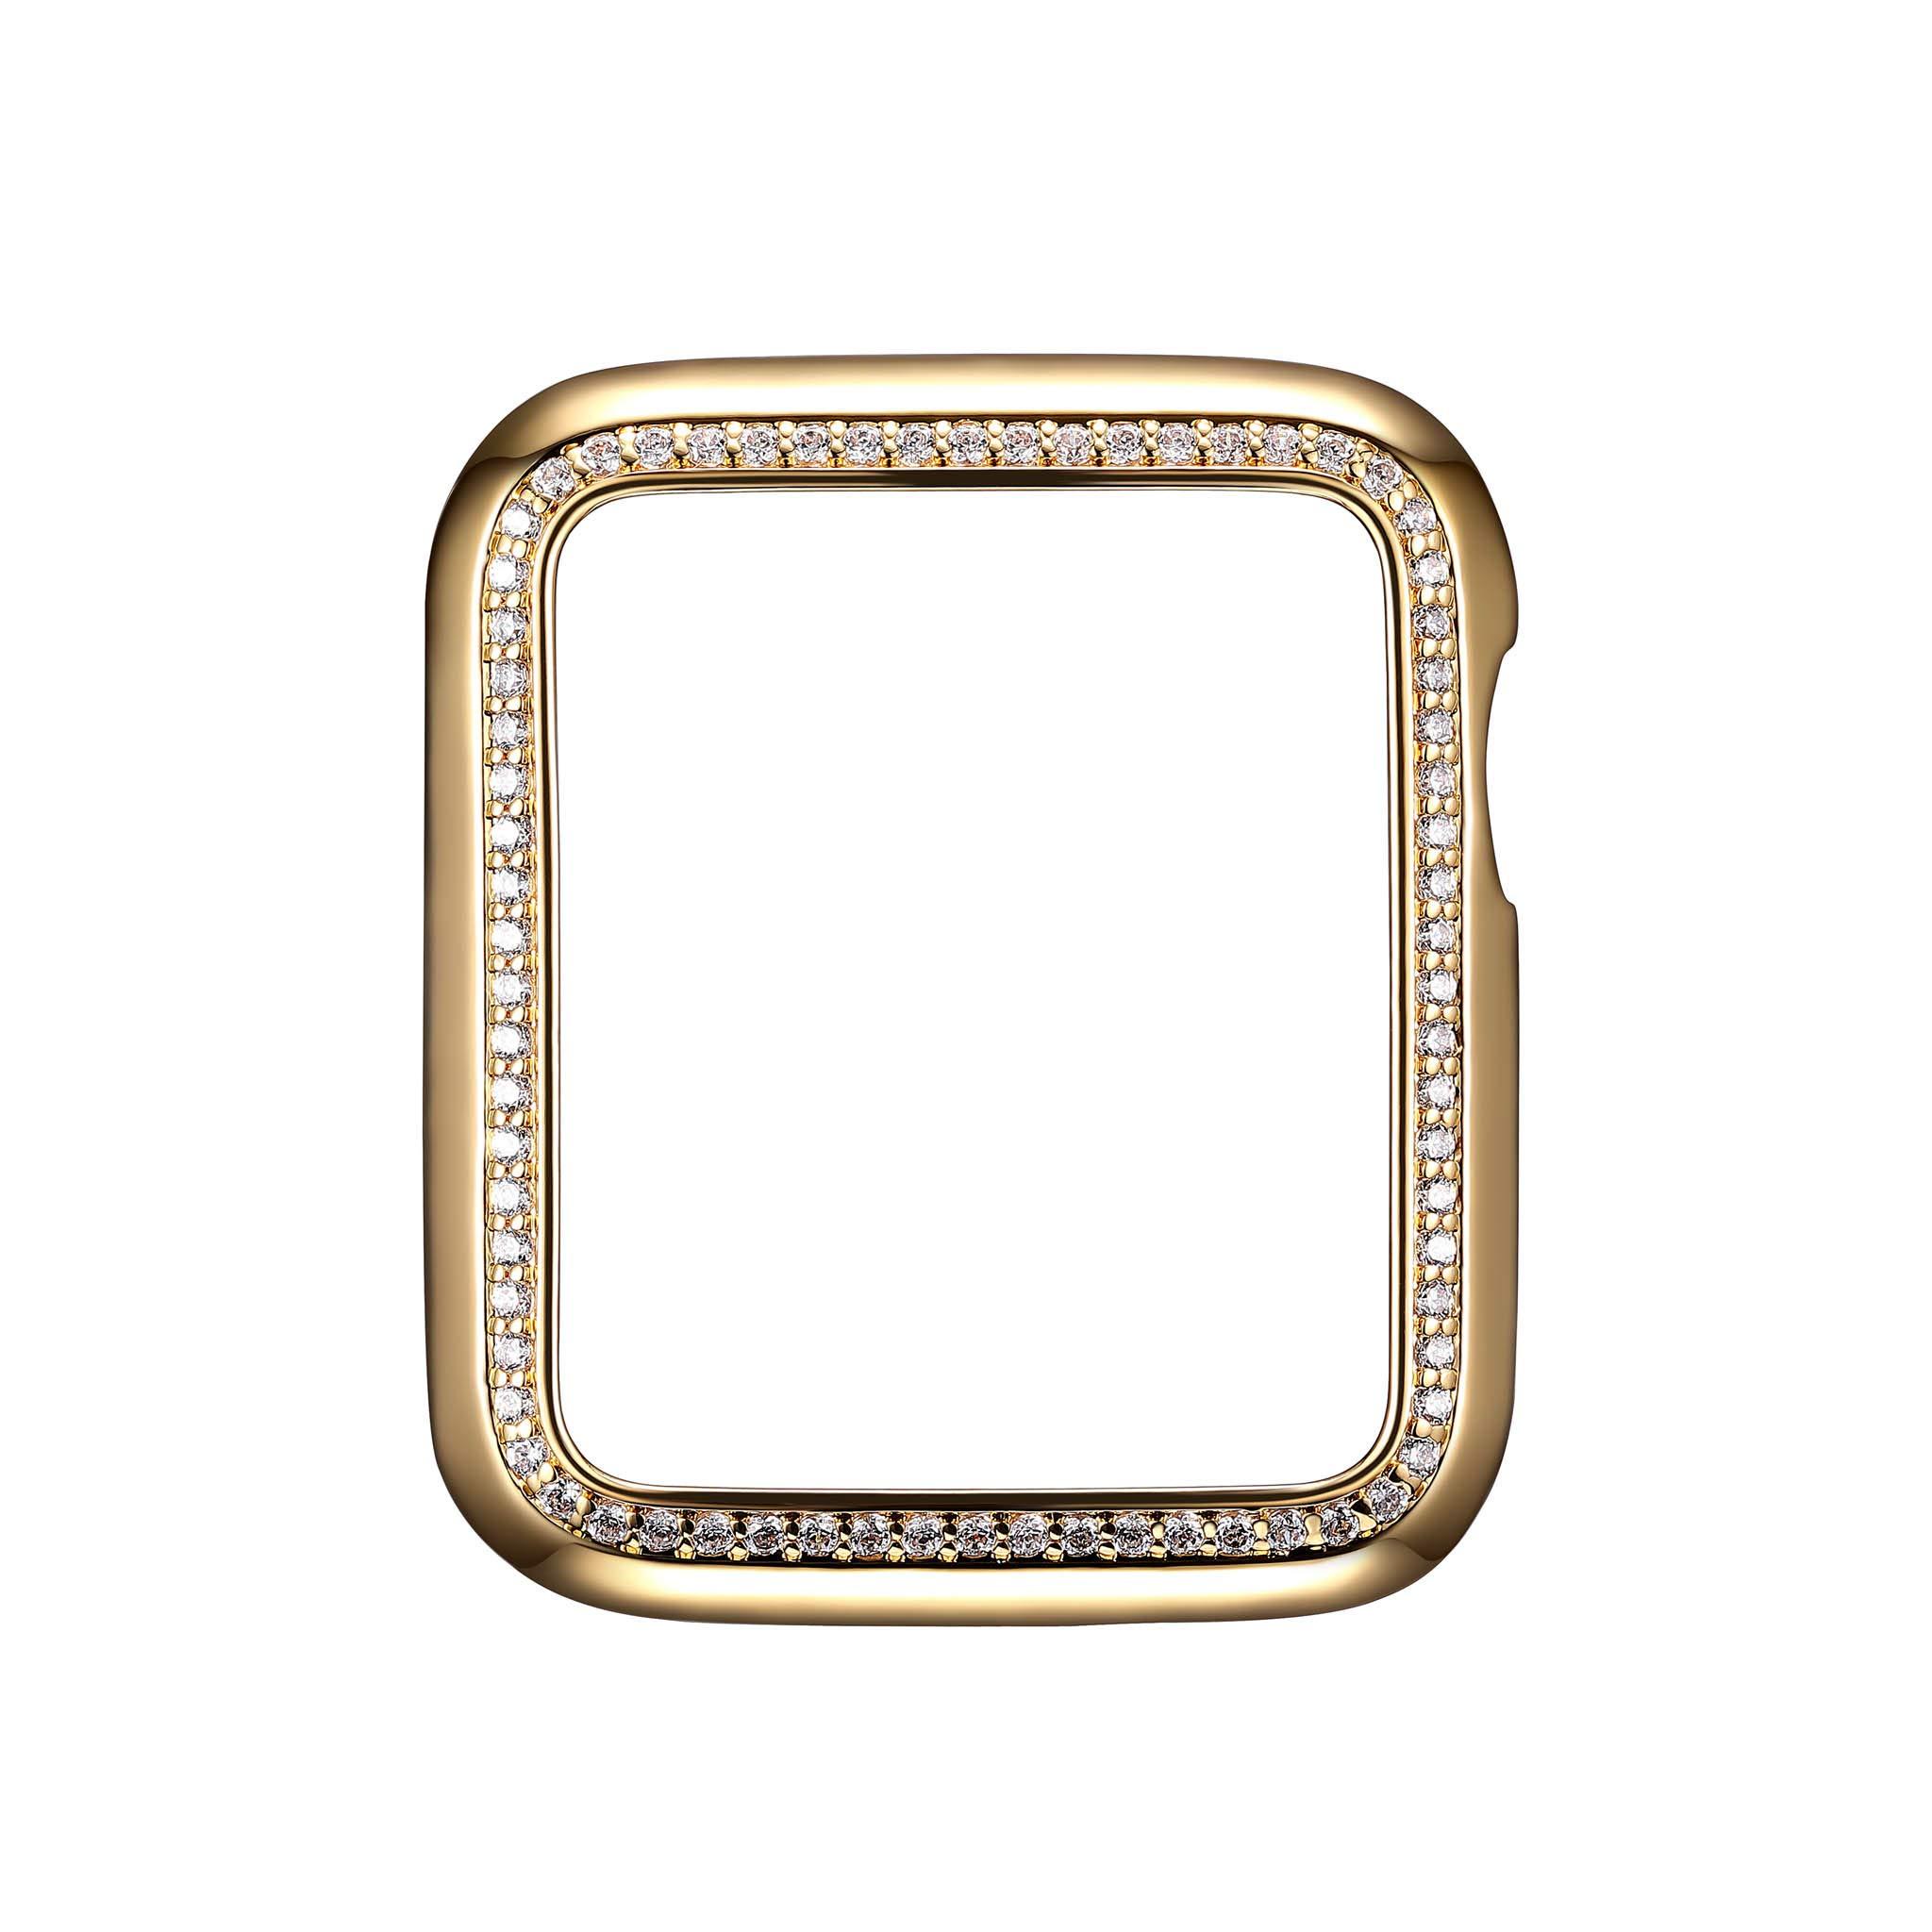 18K Yellow Gold Plated Jewelry-Style Apple Watch Case with Swarovski Zirconia CZ Border - Small (Fits 38mm iWatch)